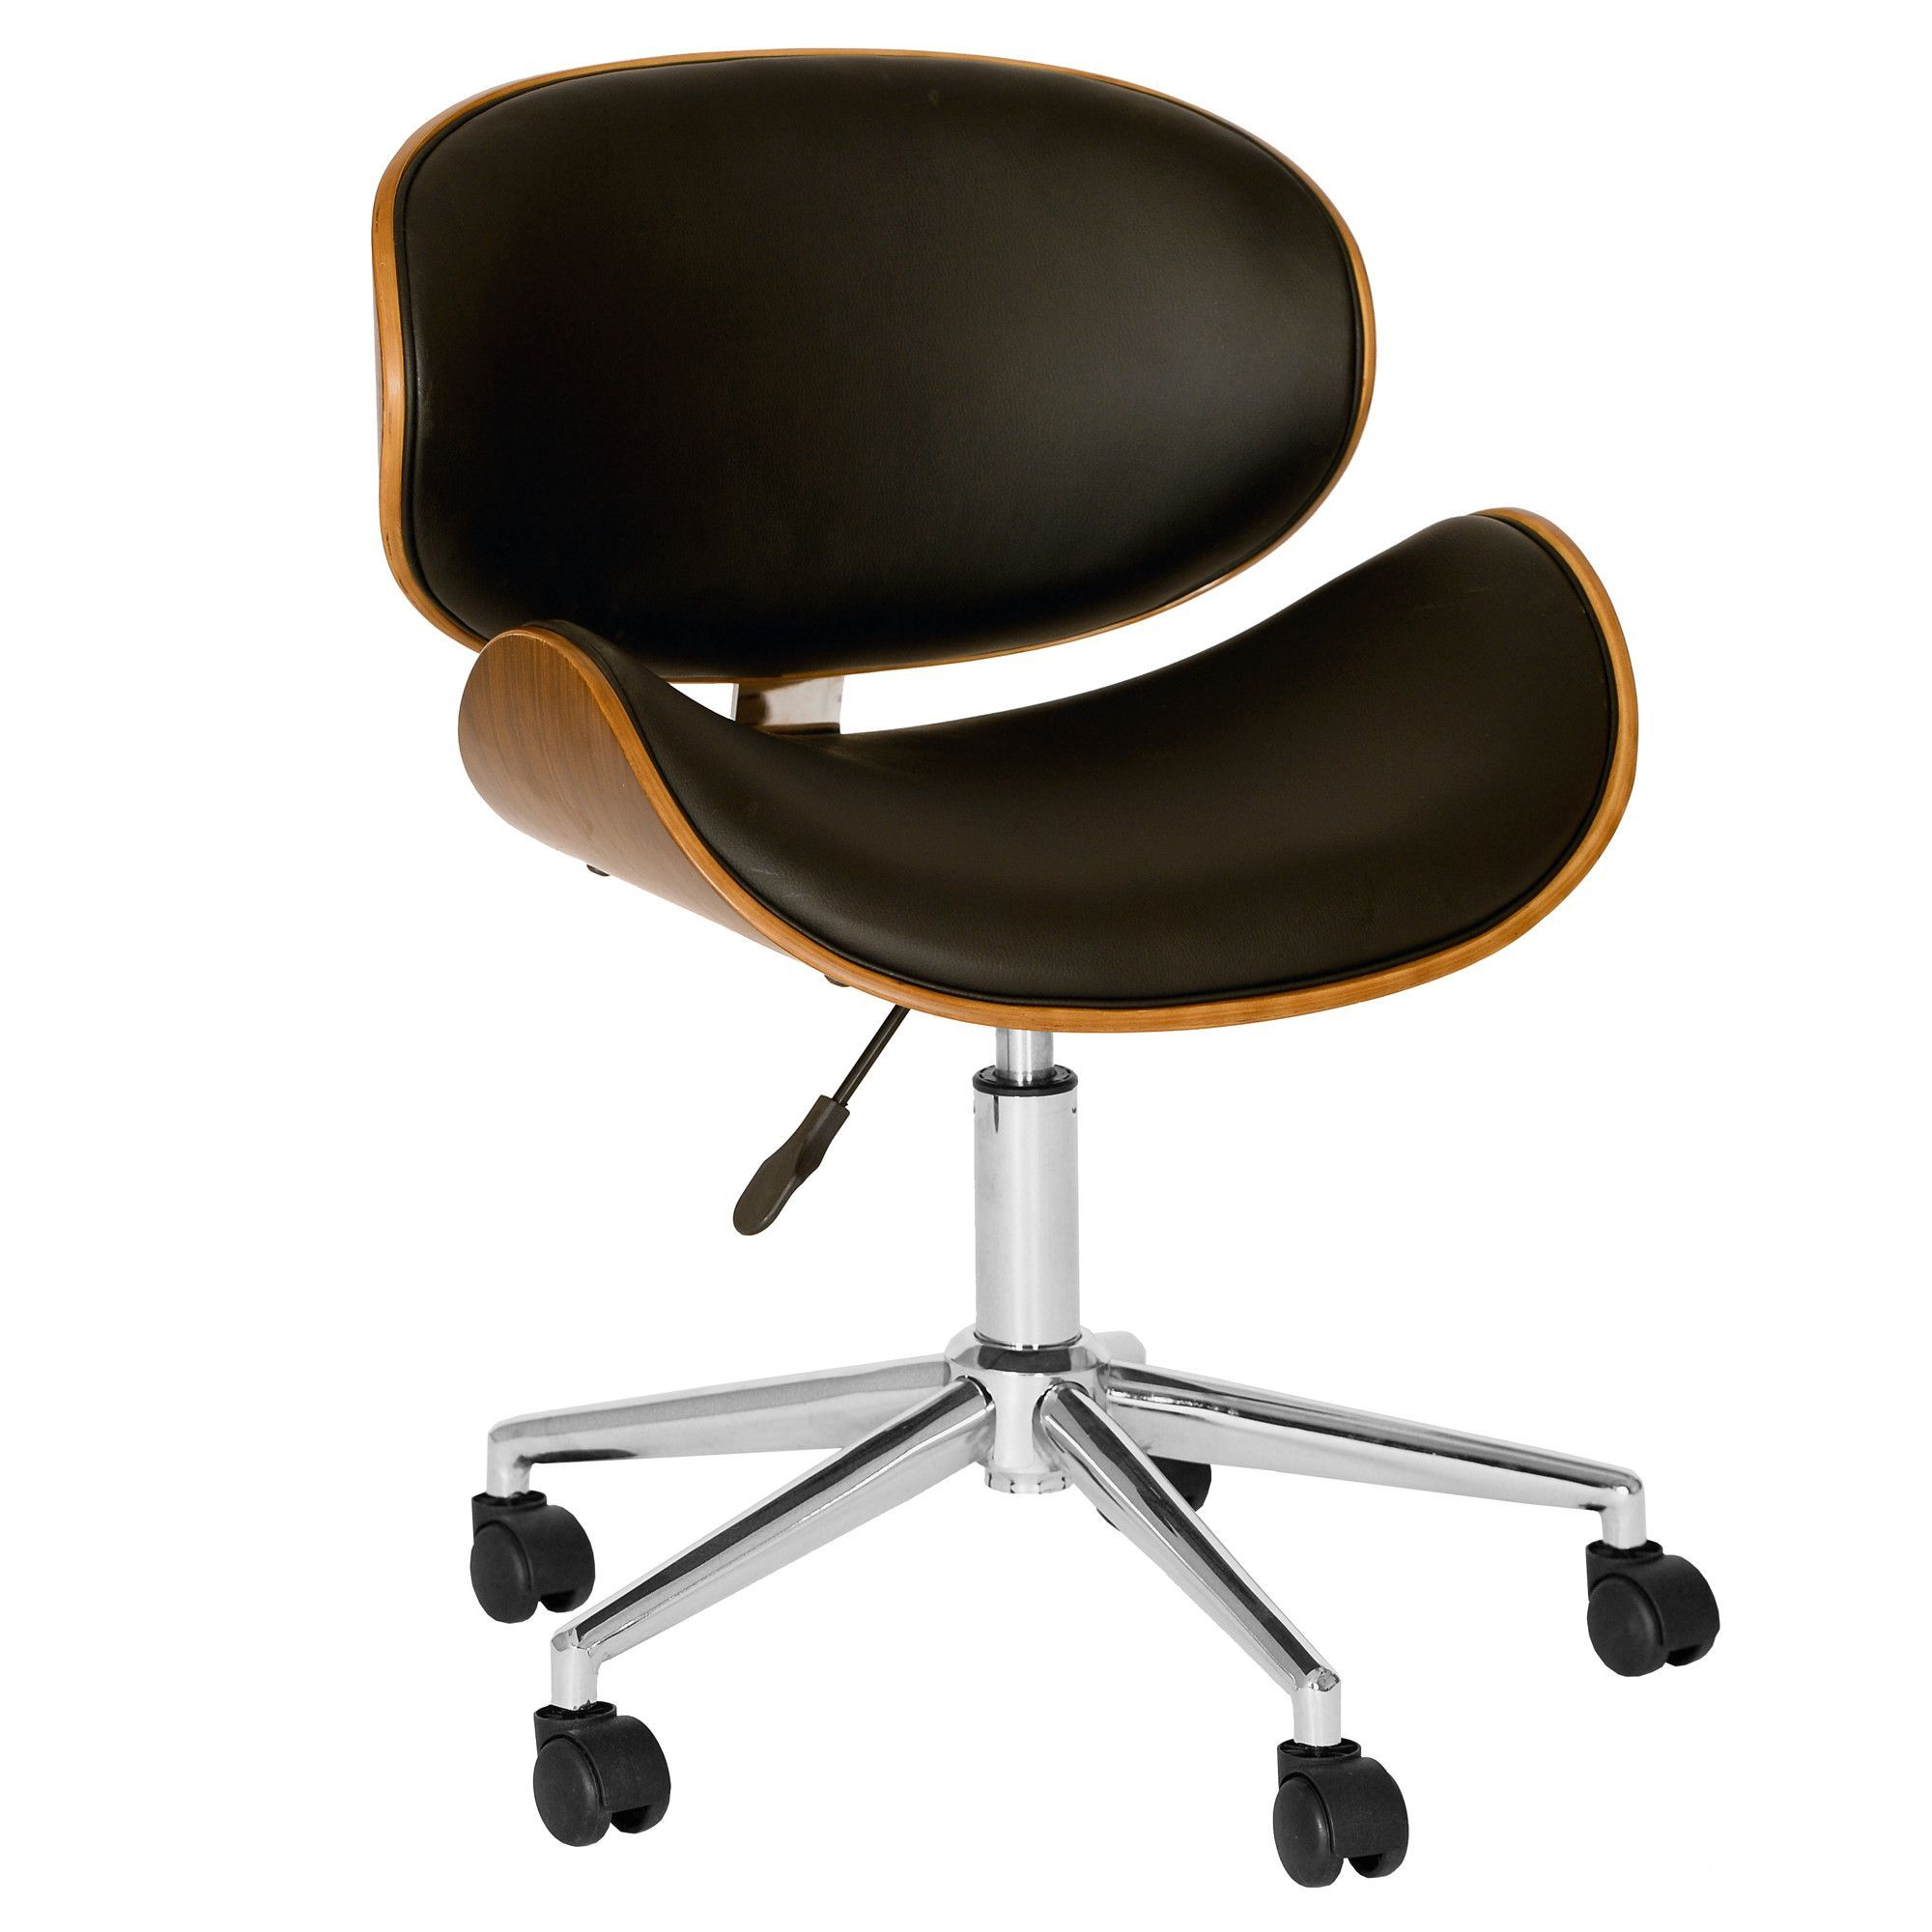 olmstead task chair peche meche adjustable office chair swivel rh pinterest com